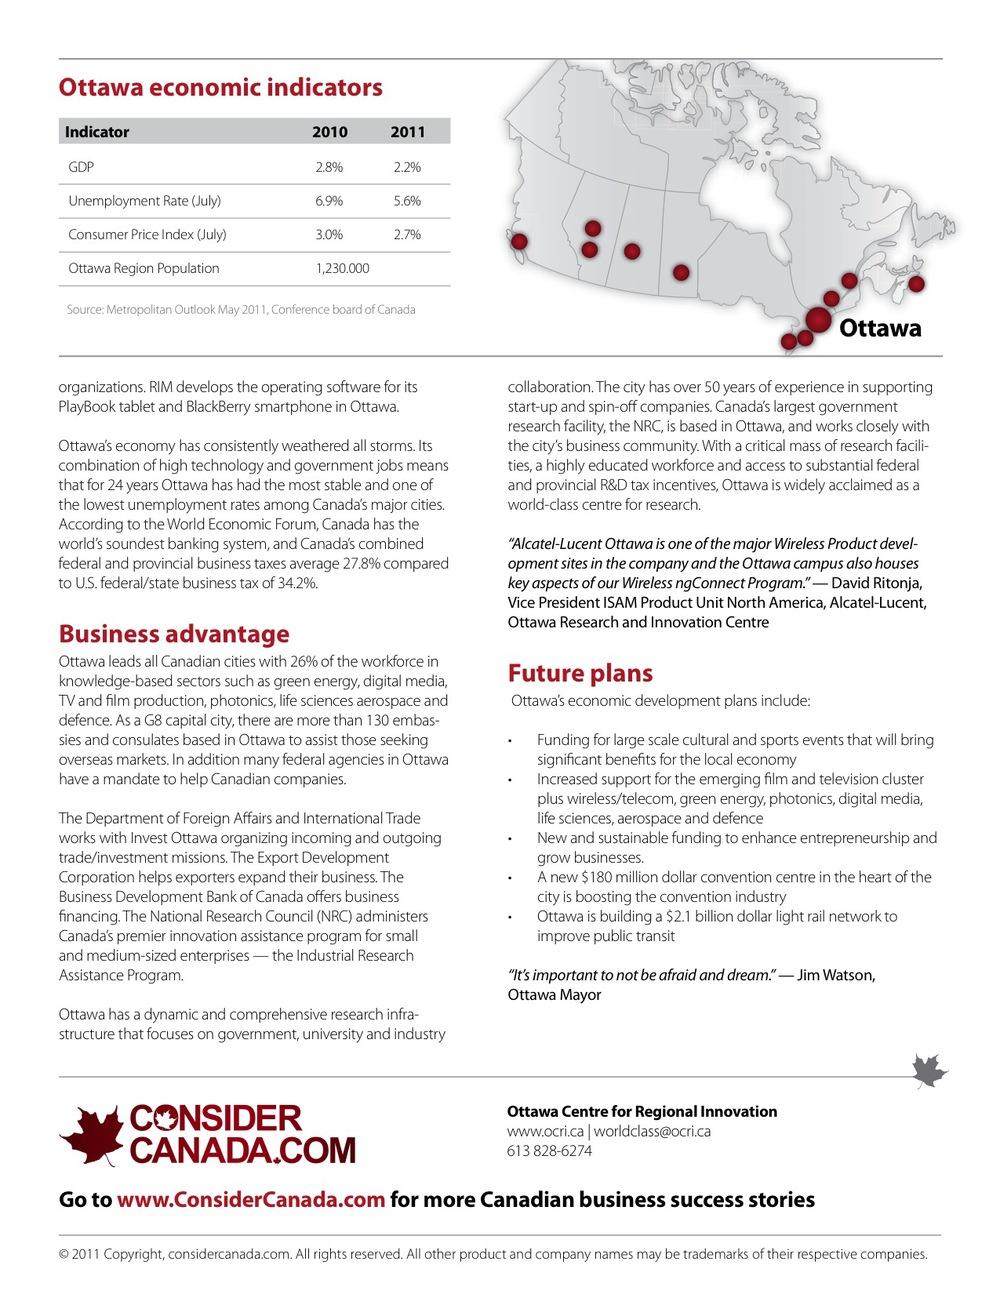 2011_09_ConsiderCanada_CityOverview_Ottawa_VIEW-page2.jpg